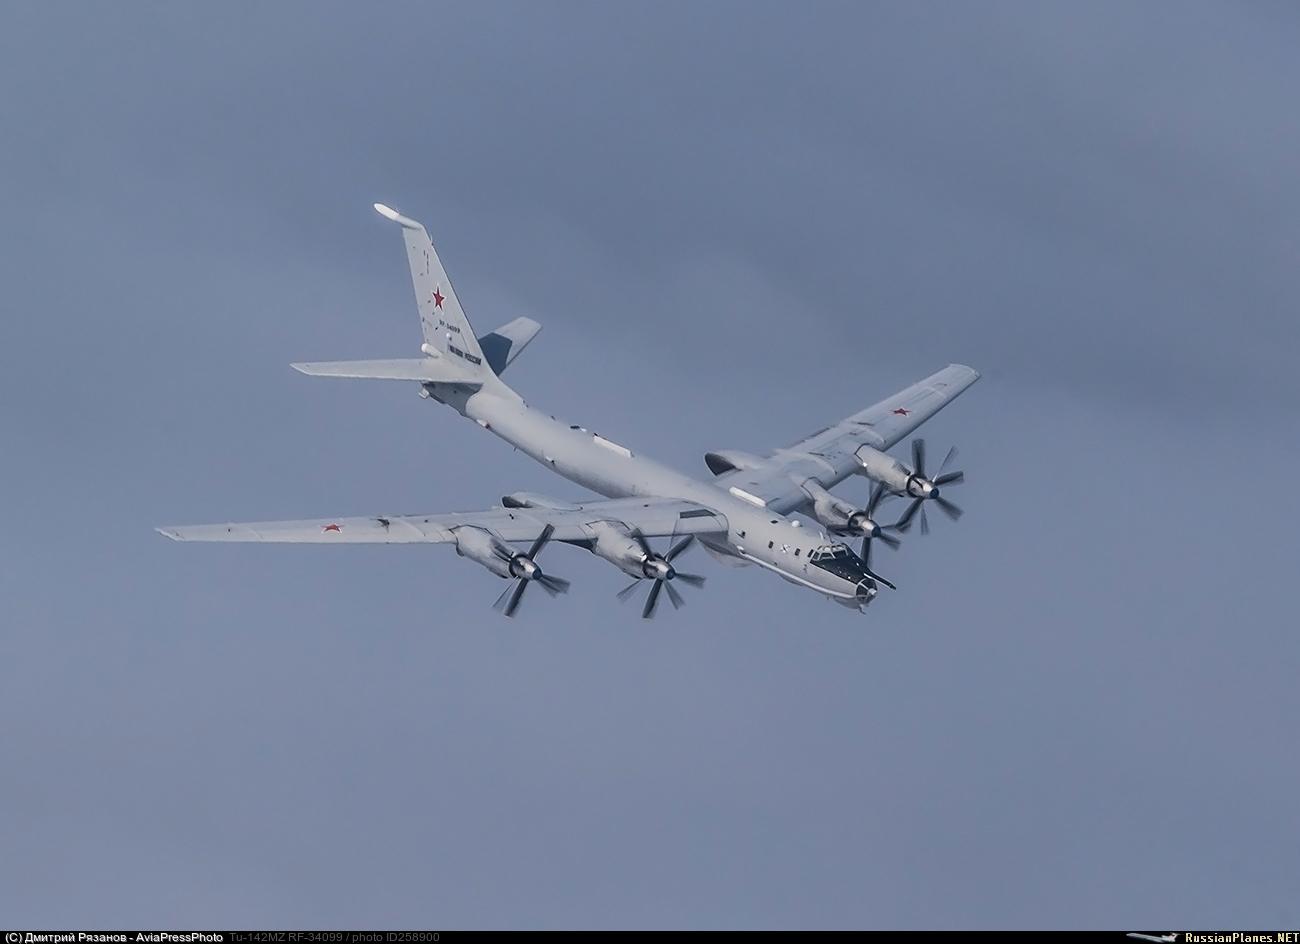 https://russianplanes.net/images/to259000/258900.jpg